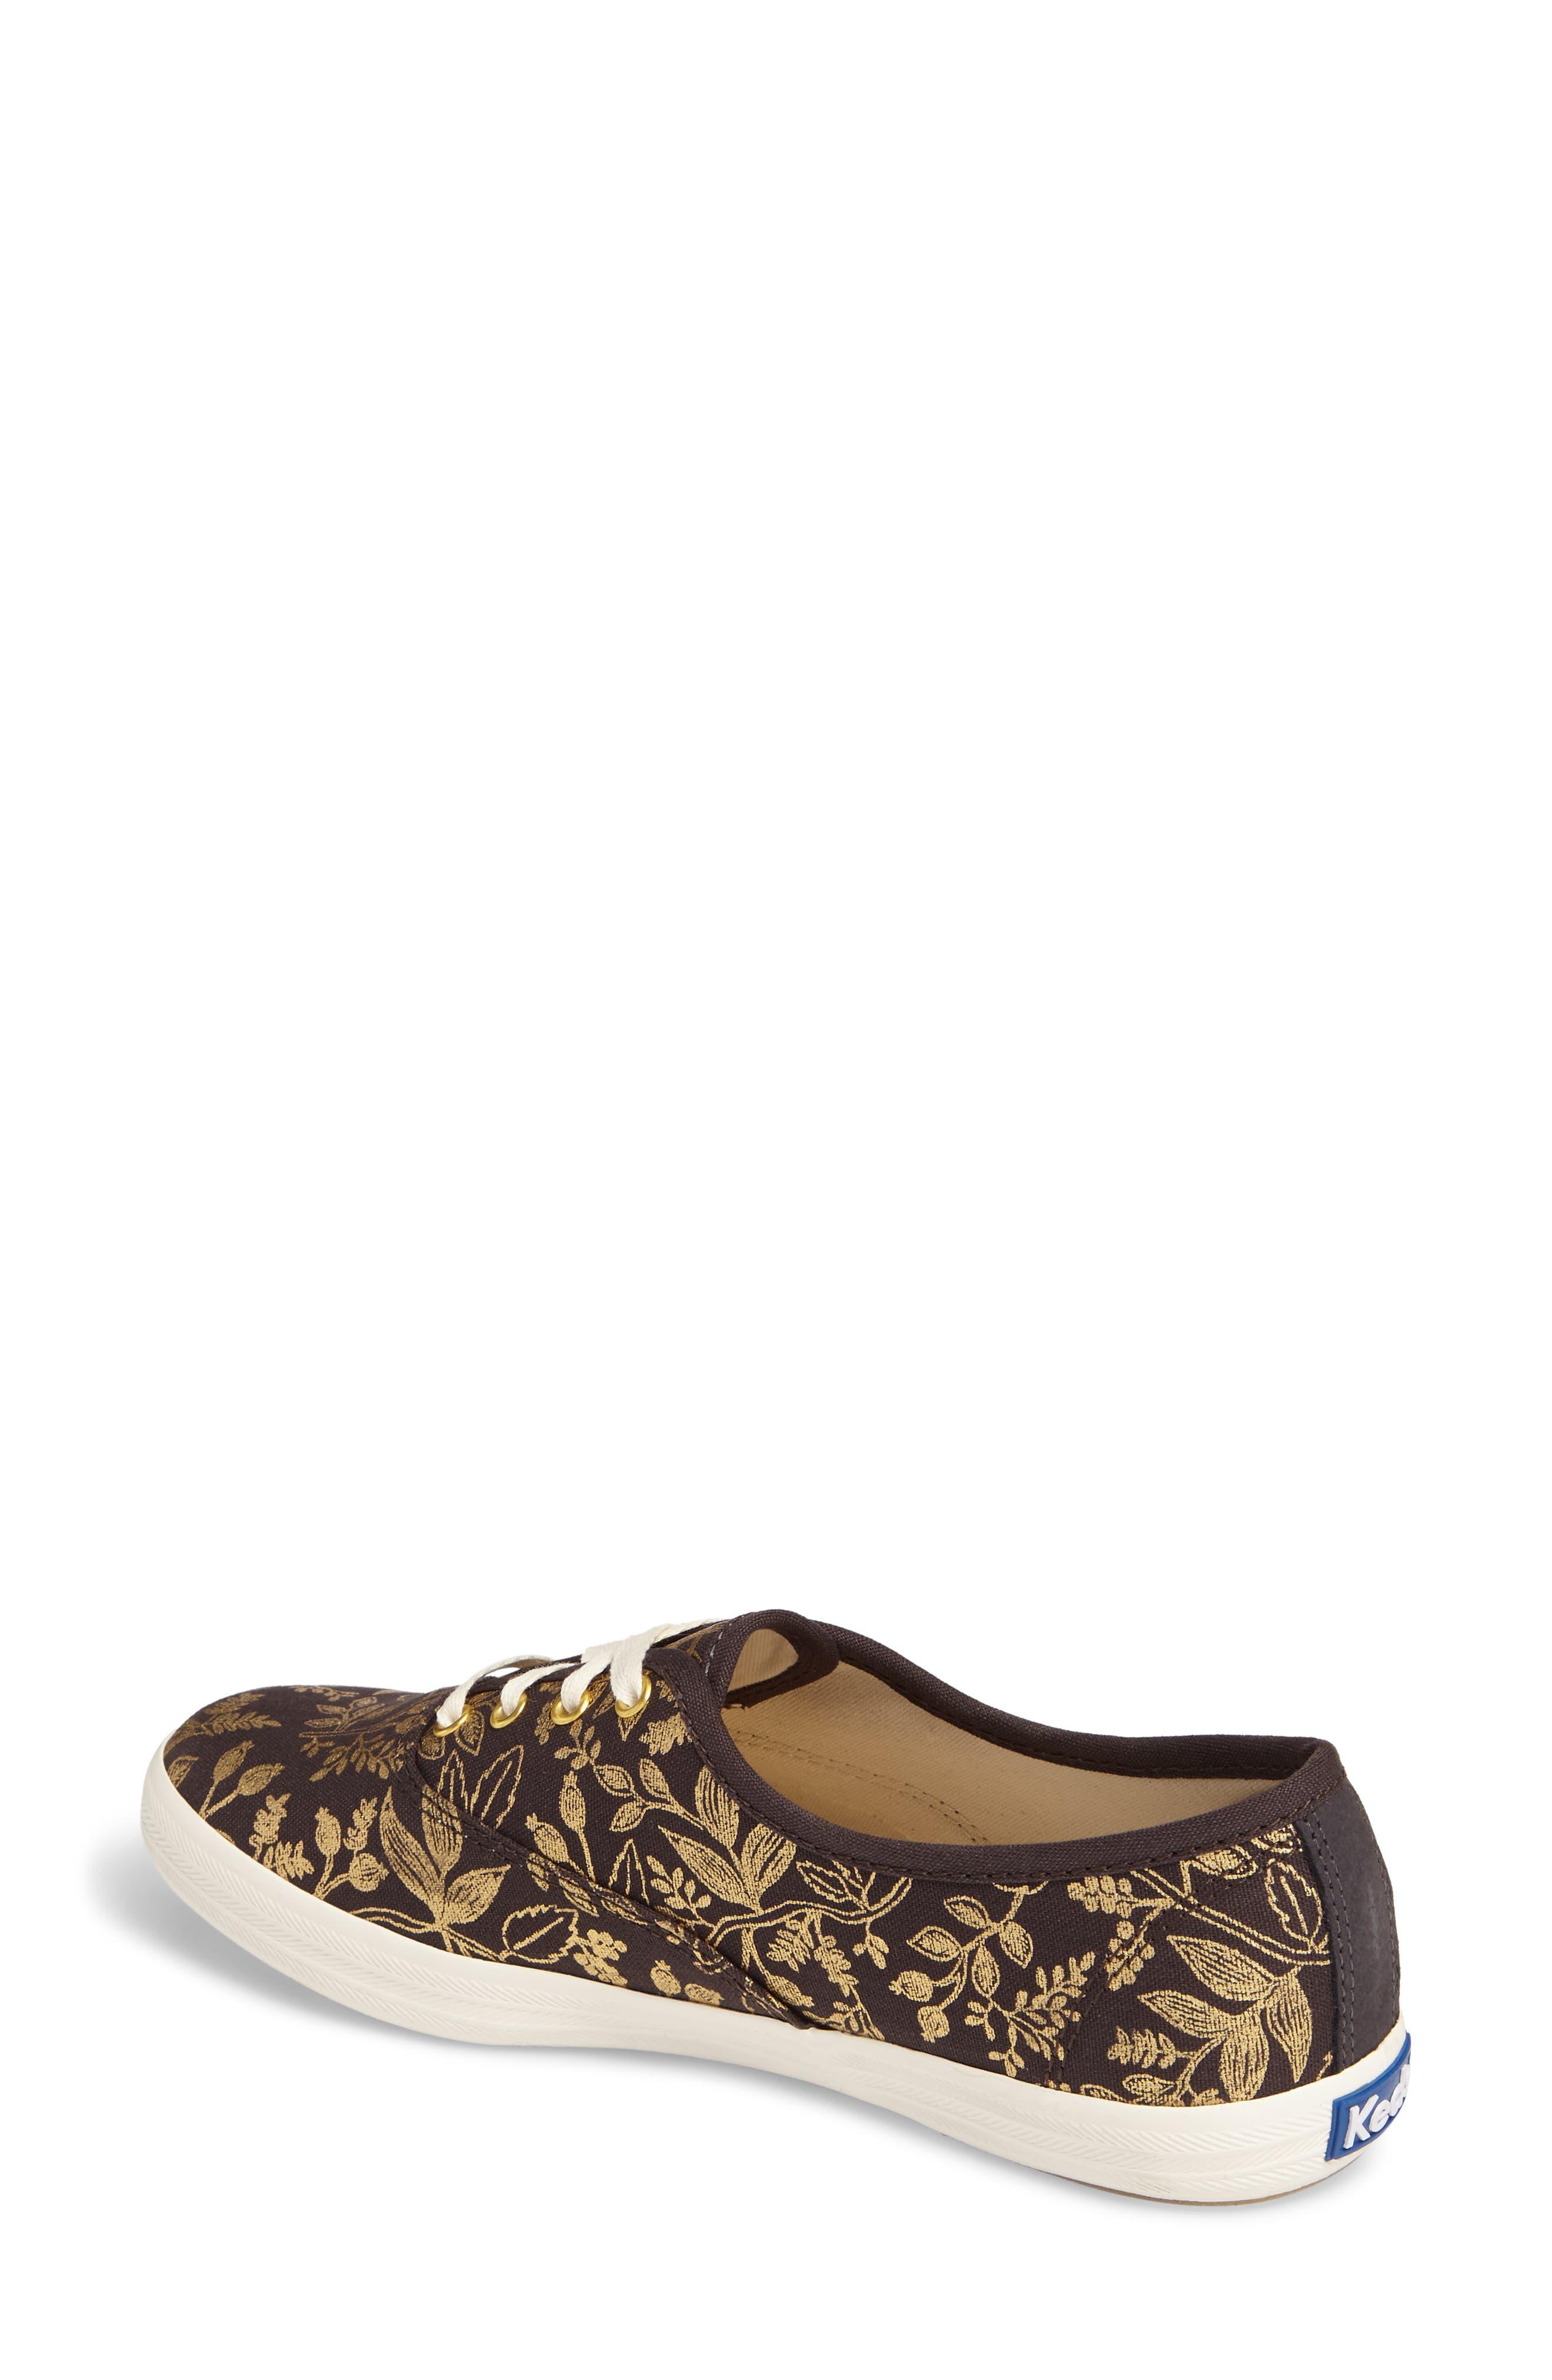 Alternate Image 2  - Keds® x Rifle Paper Co. Queen Anne Sneaker (Women)